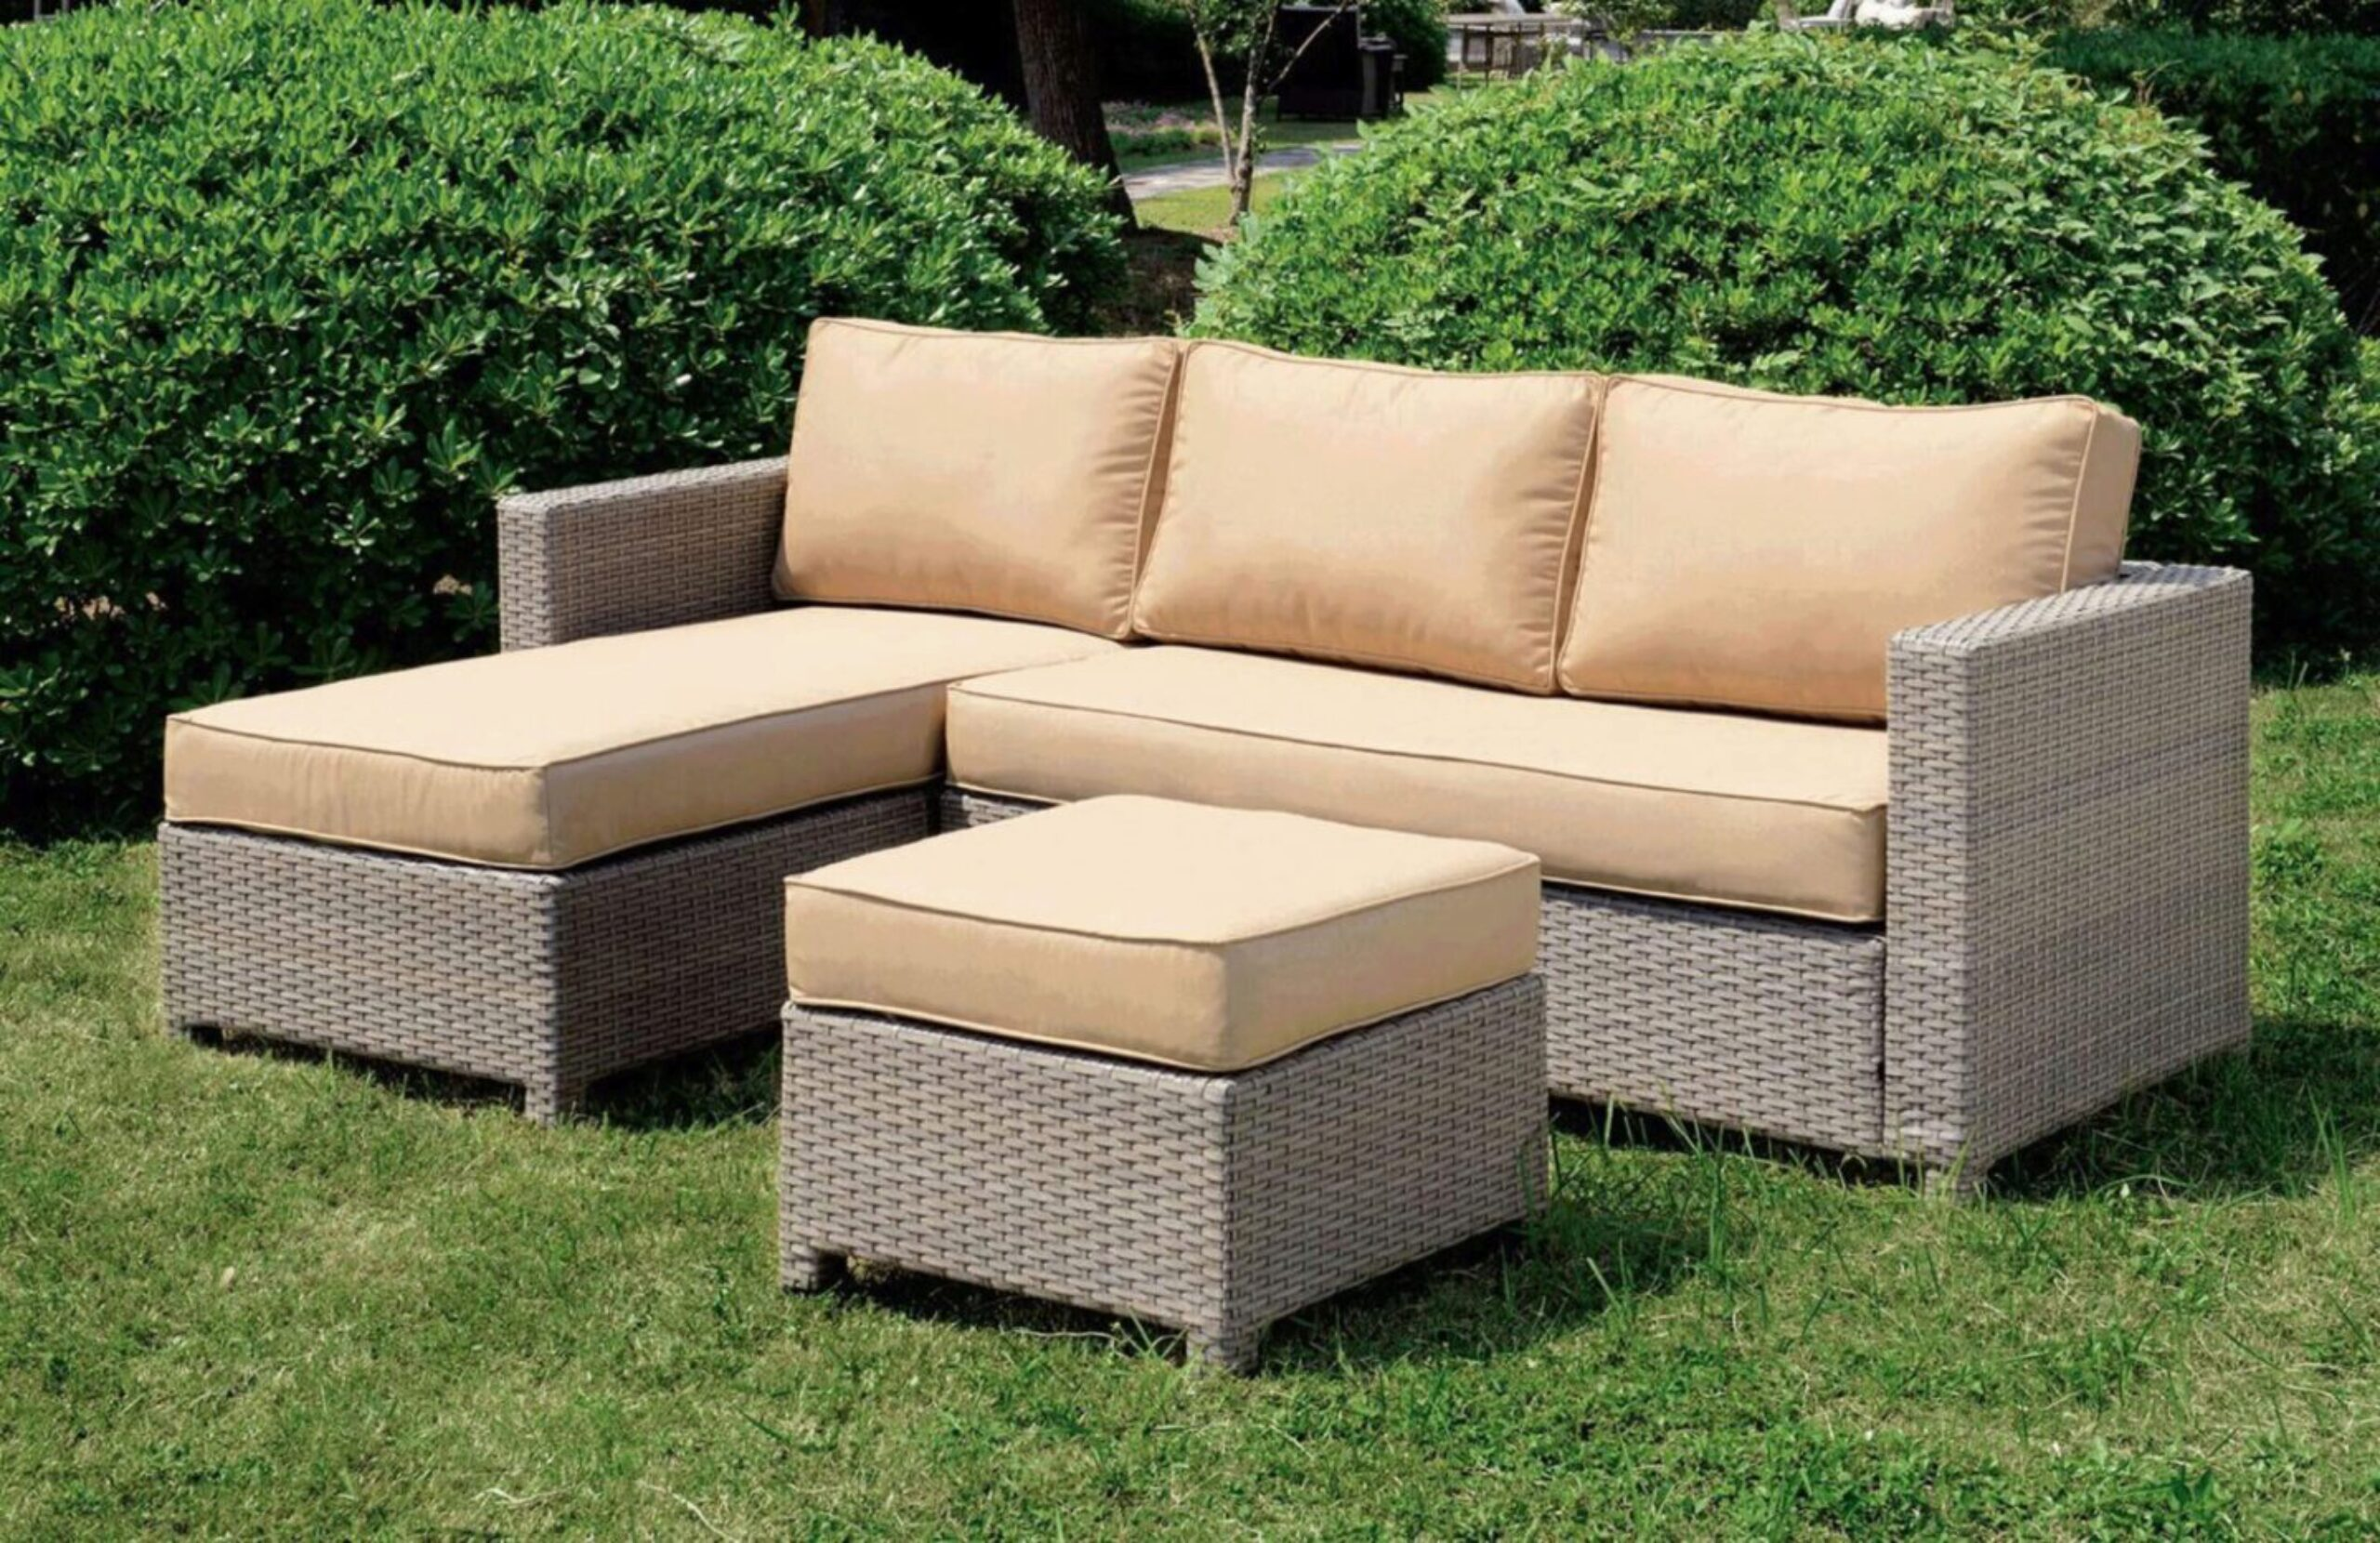 furniture of america sabina dark grey wicker patio l sectional w ottoman 2pcs set